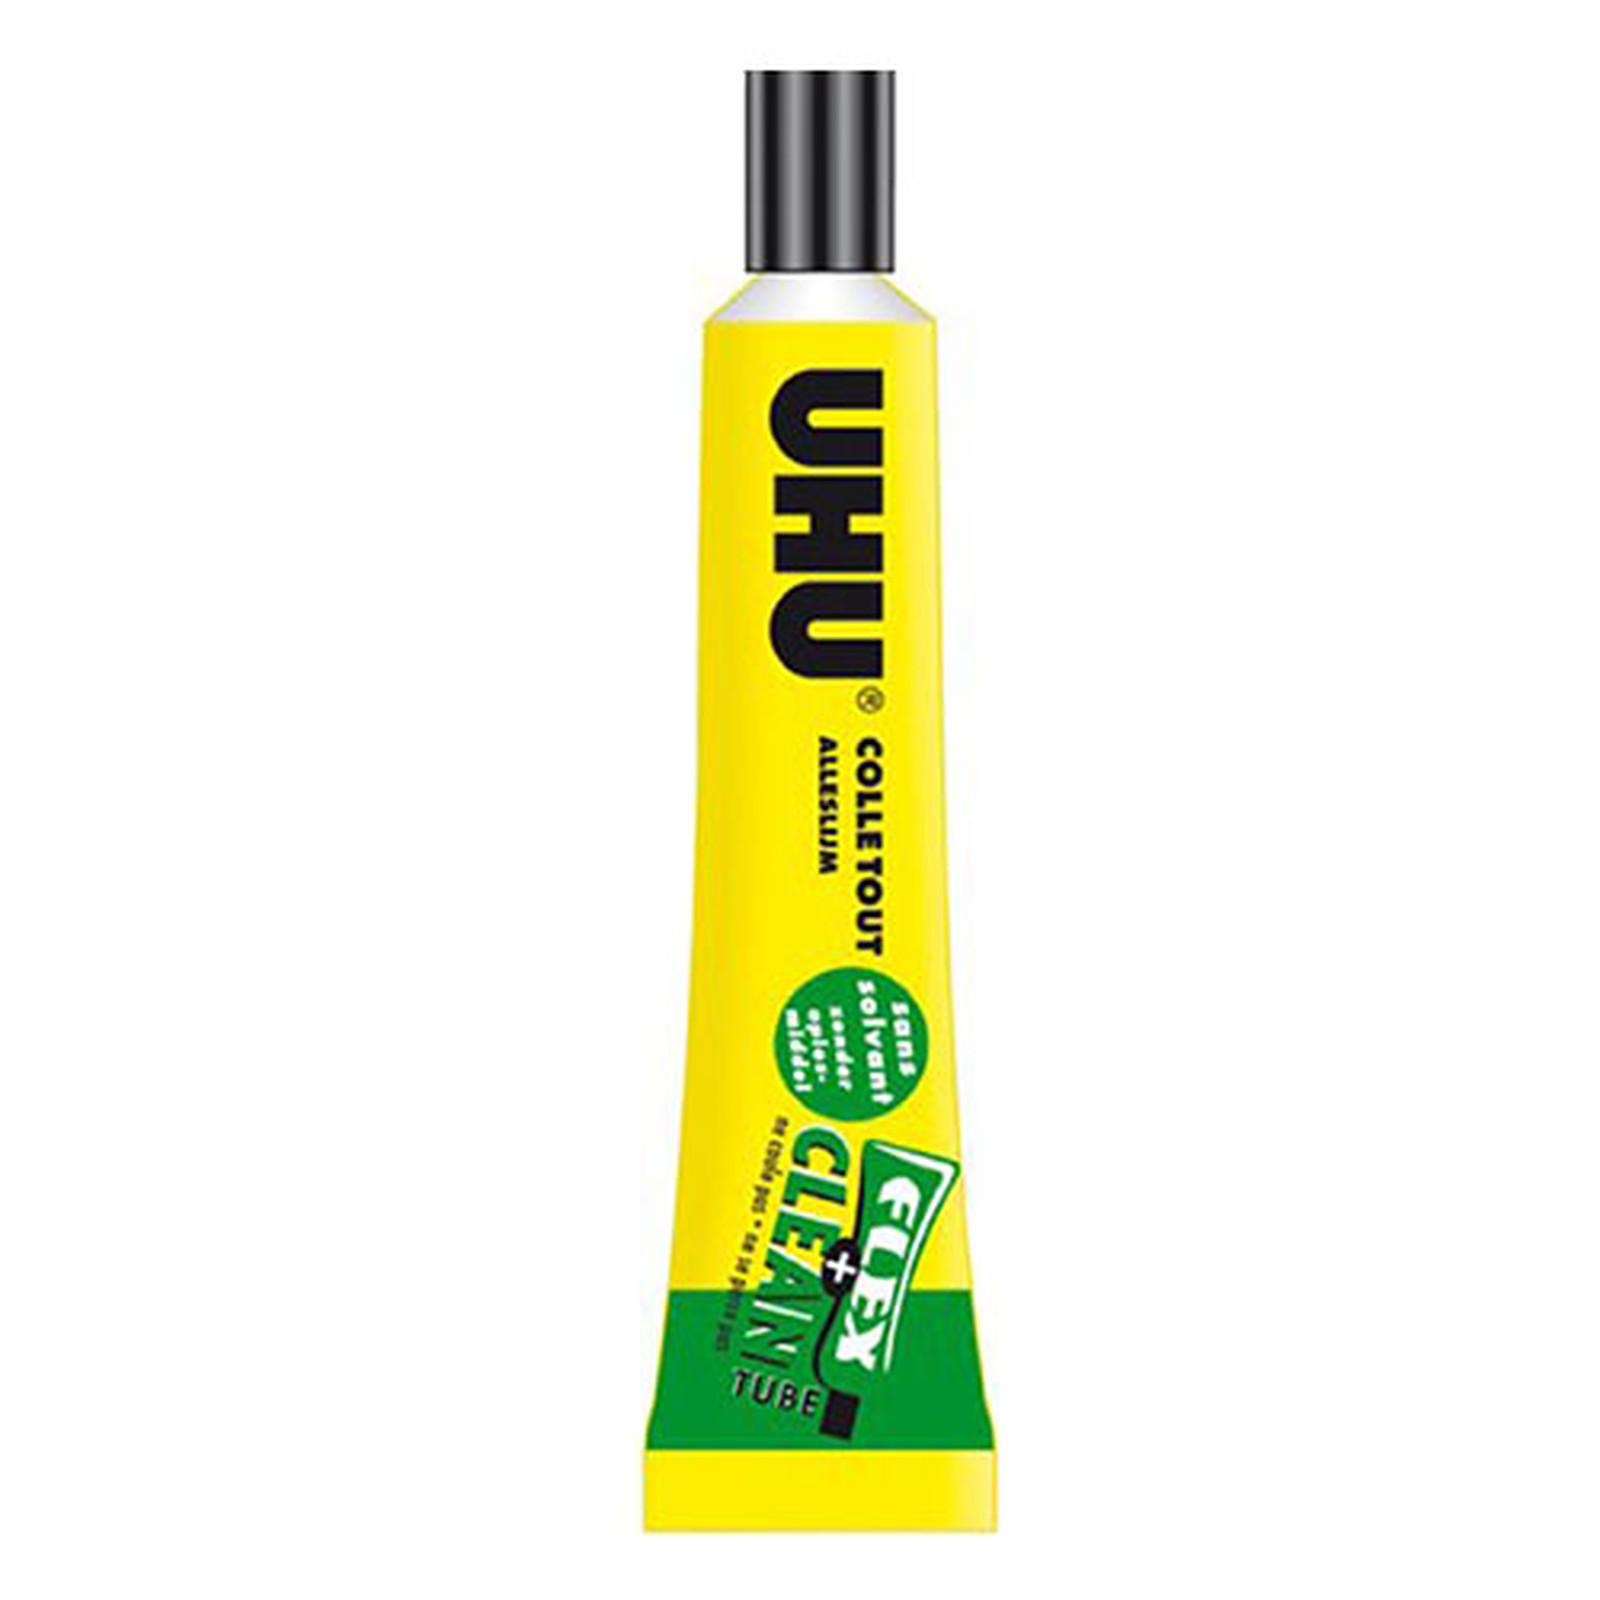 Uhu flex+clean Colle forte universelle transparente